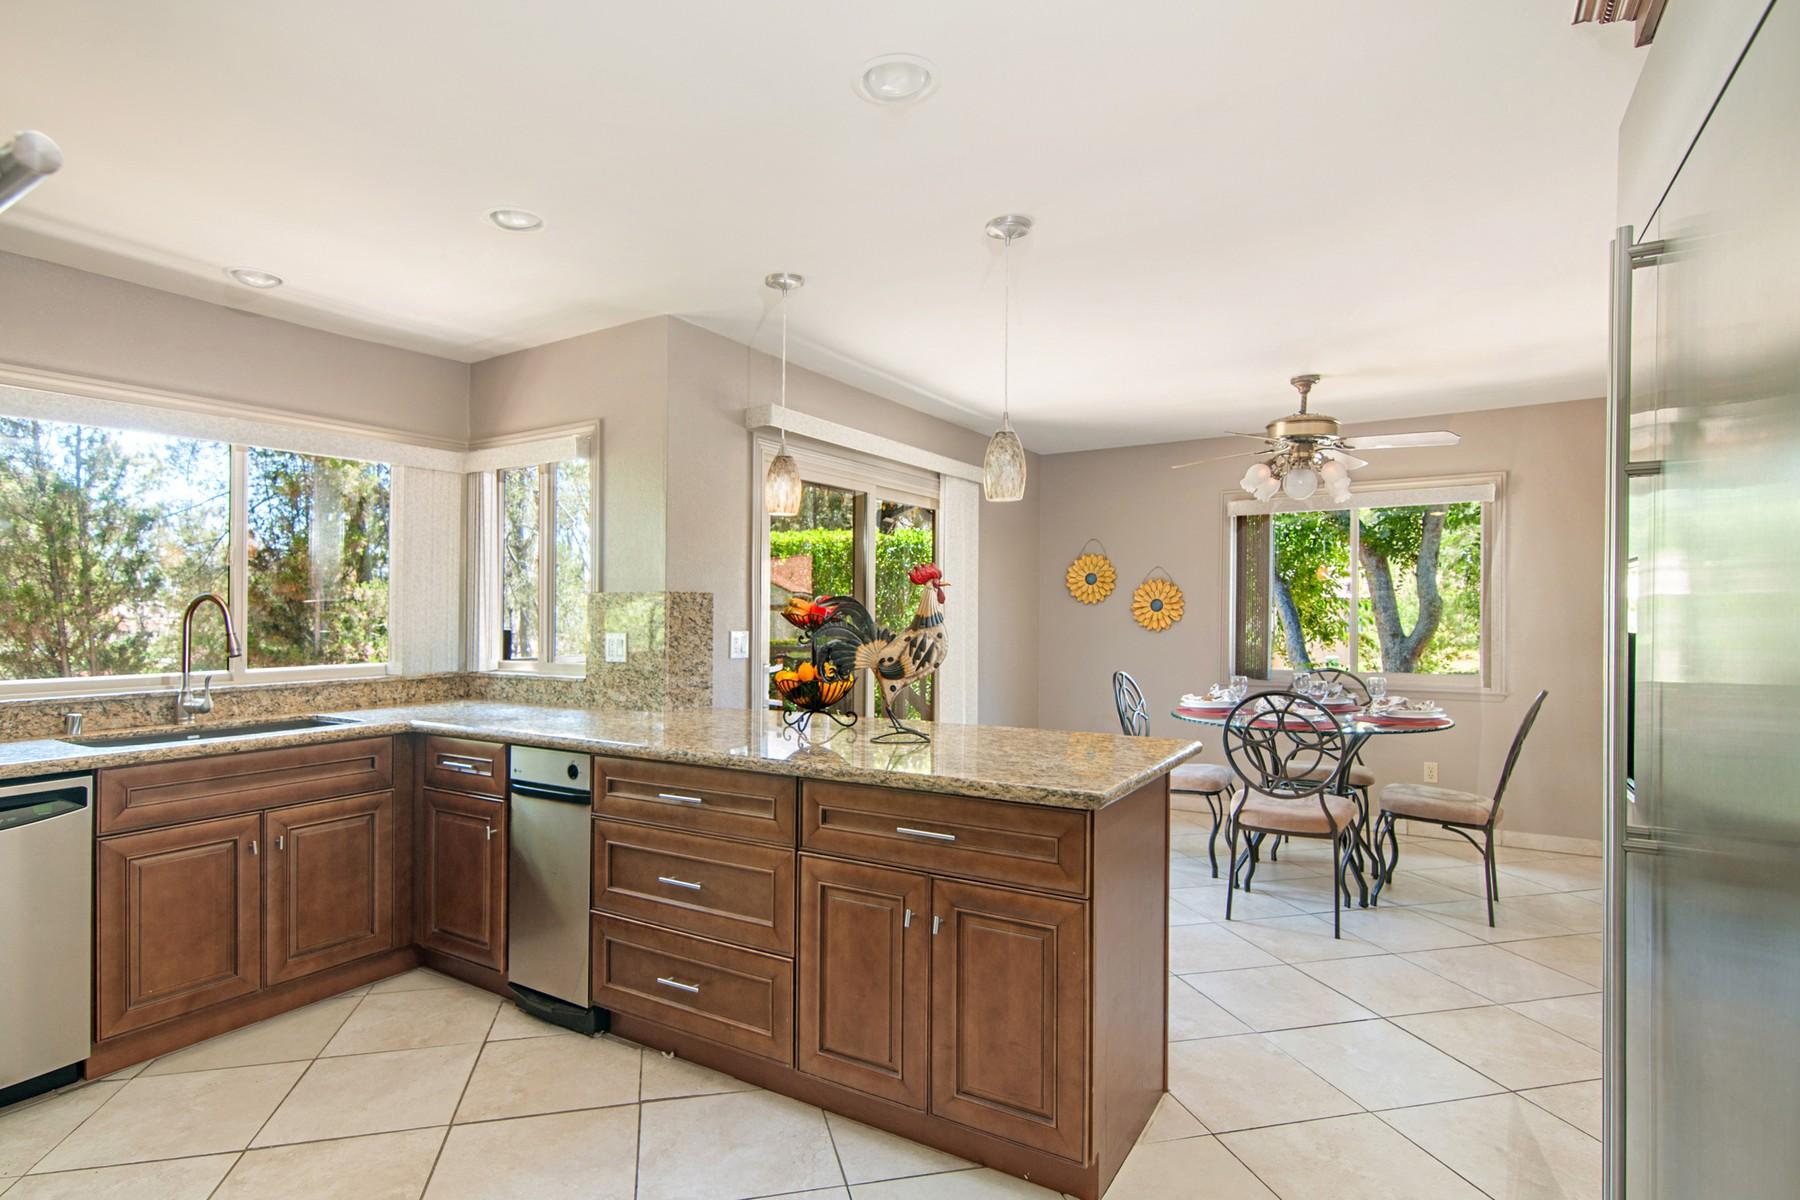 Additional photo for property listing at 3202 Avenida Hacienda  Escondido, California 92029 Estados Unidos